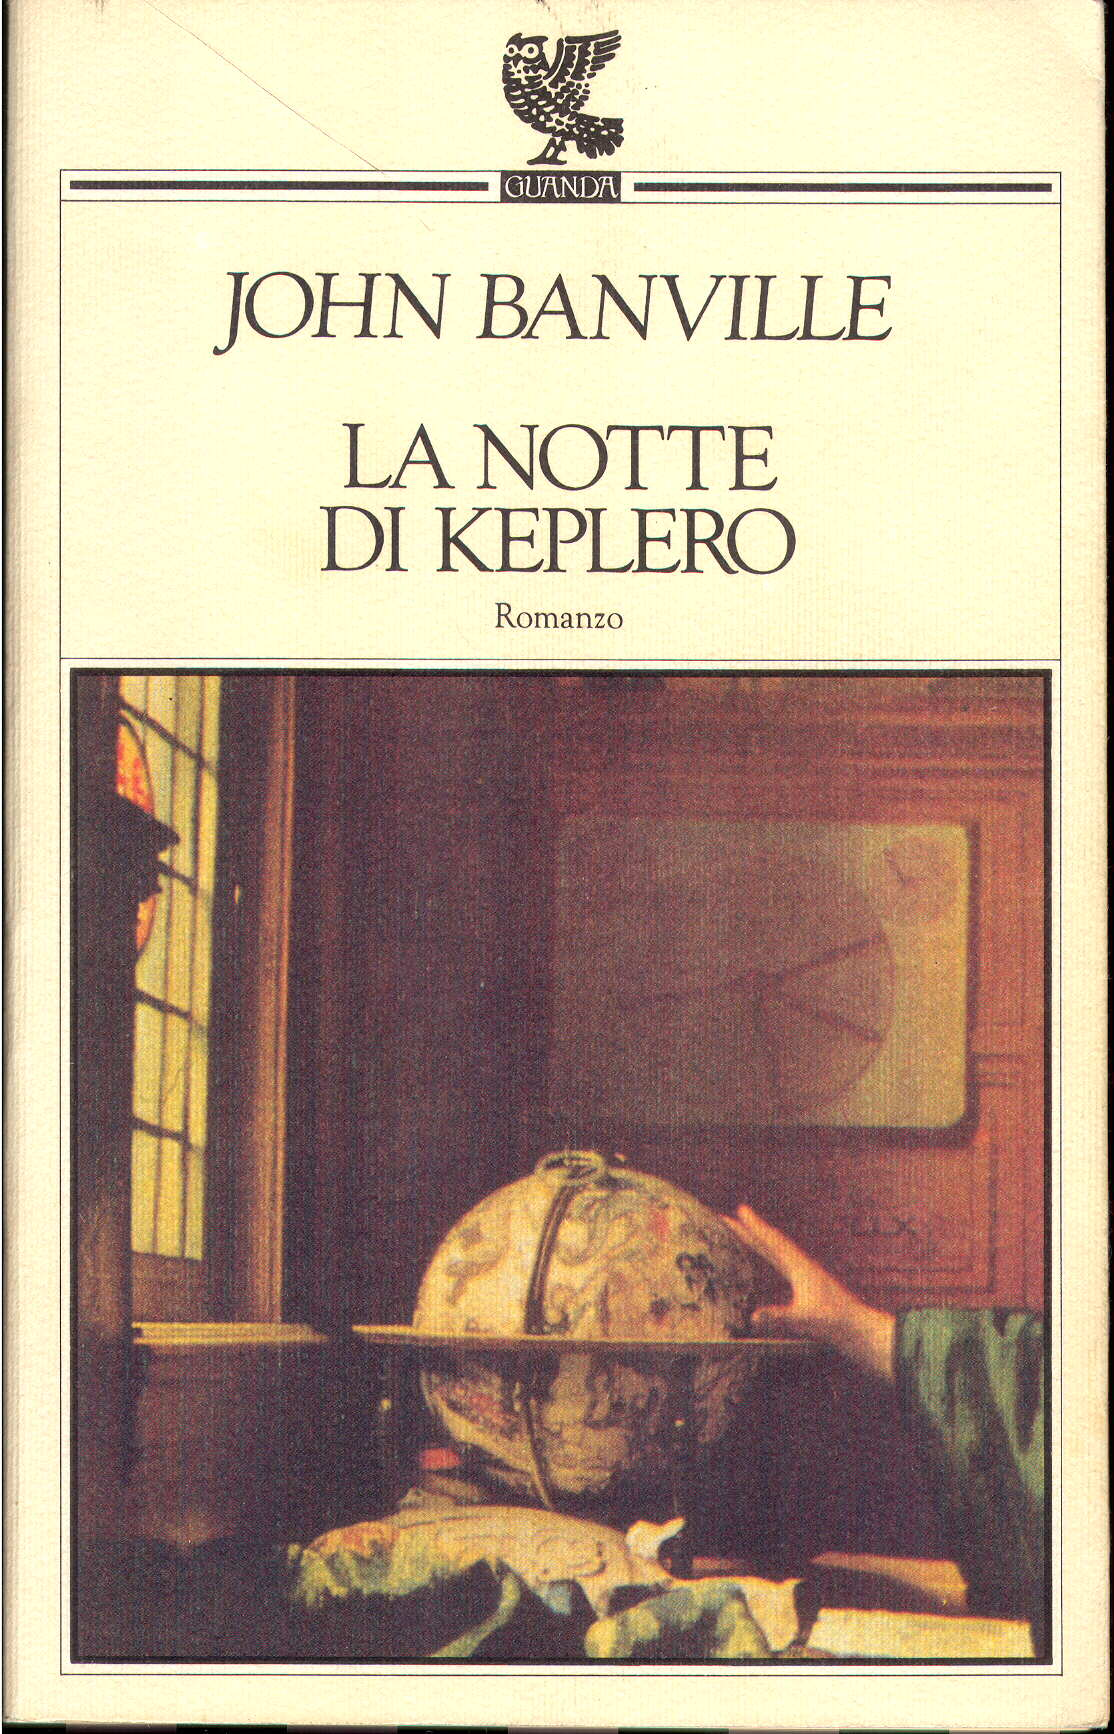 La notte di Keplero